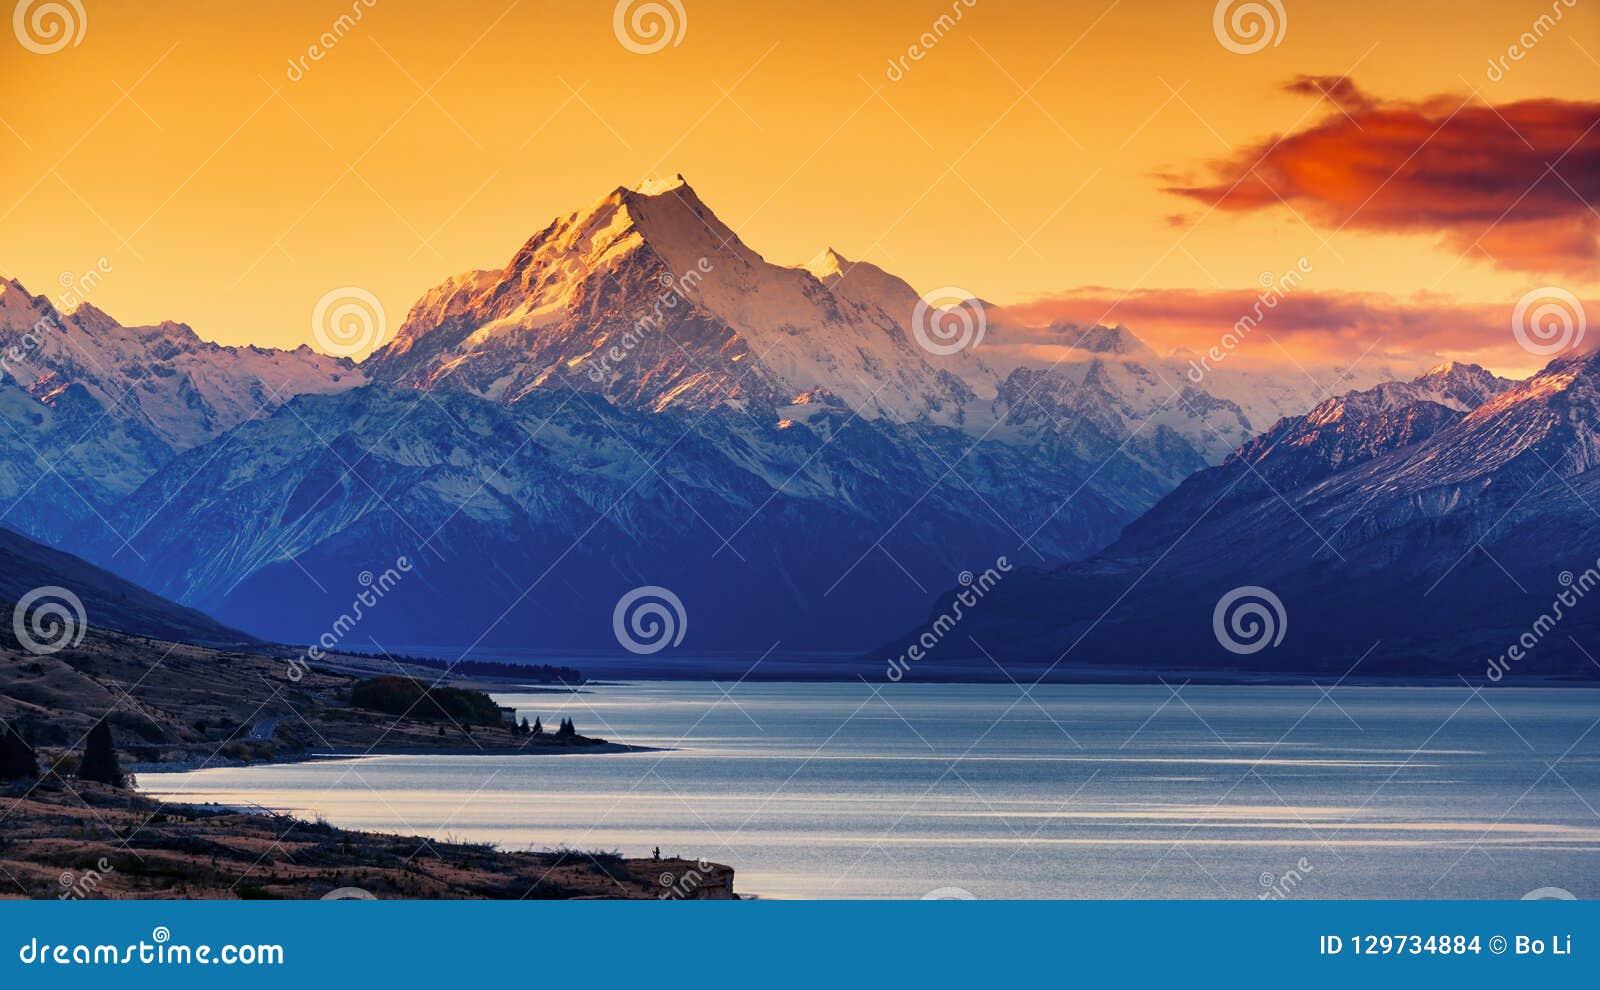 Sunset of Mount Cook and Lake Pukaki